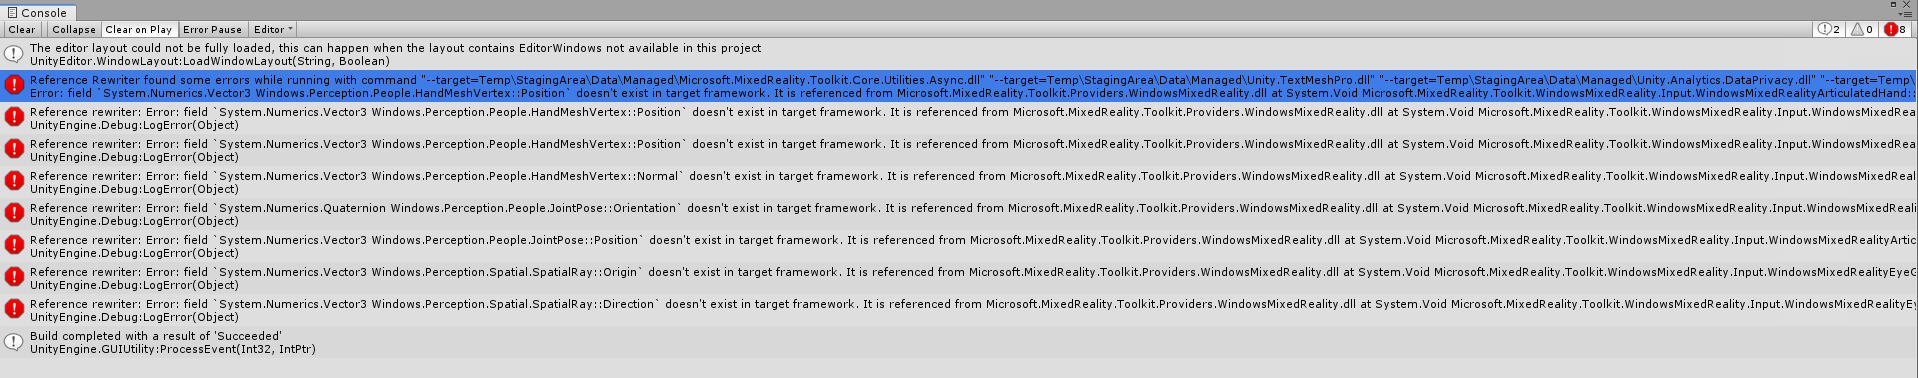 Issues in MRTK for Hololens 2 and Hololens 2 Emulator